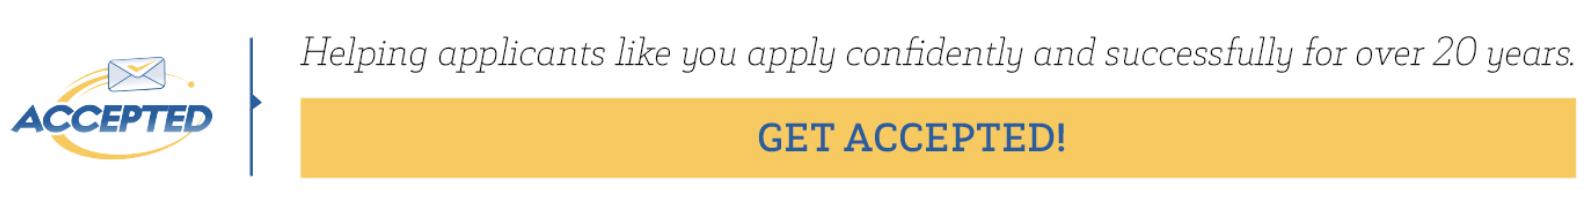 15 Crazy College Application Essay Questions - Fastweb